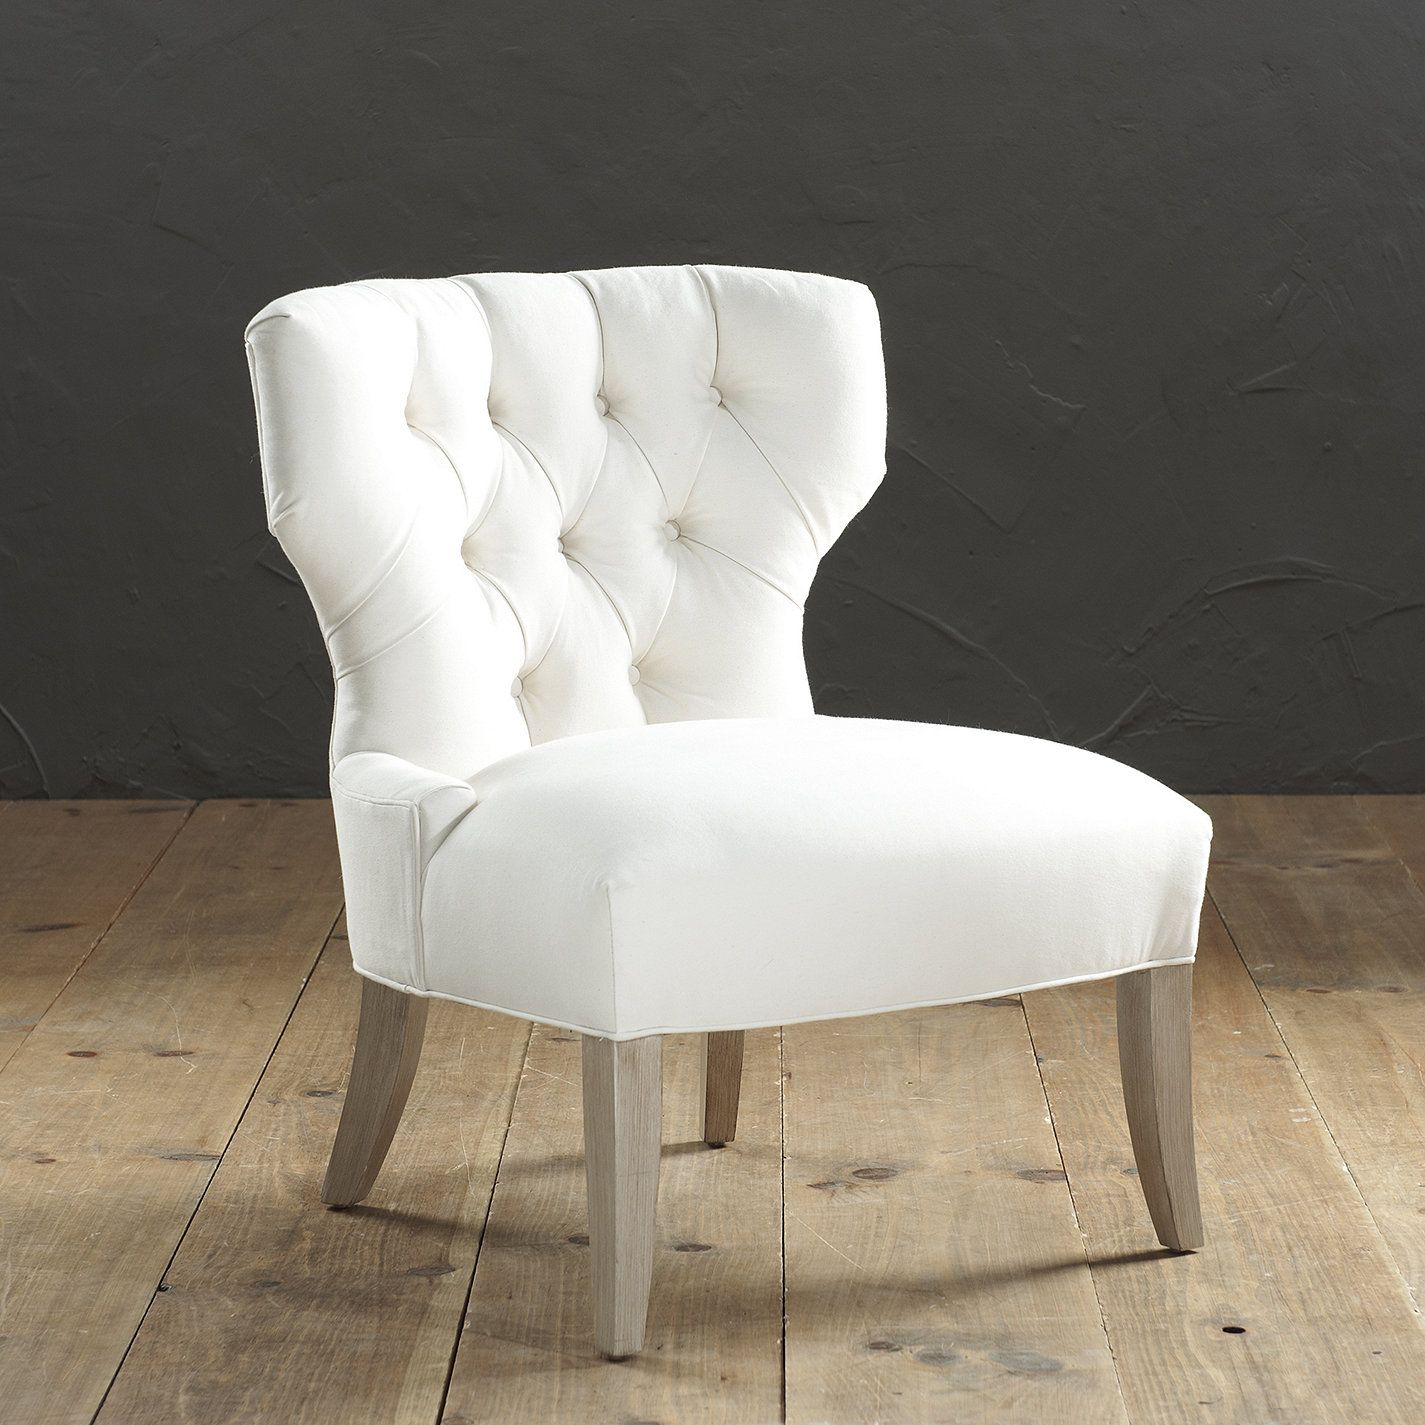 Louis cane back dining chair set of 2 ballard designs - Sadler Chair Ballard Designs